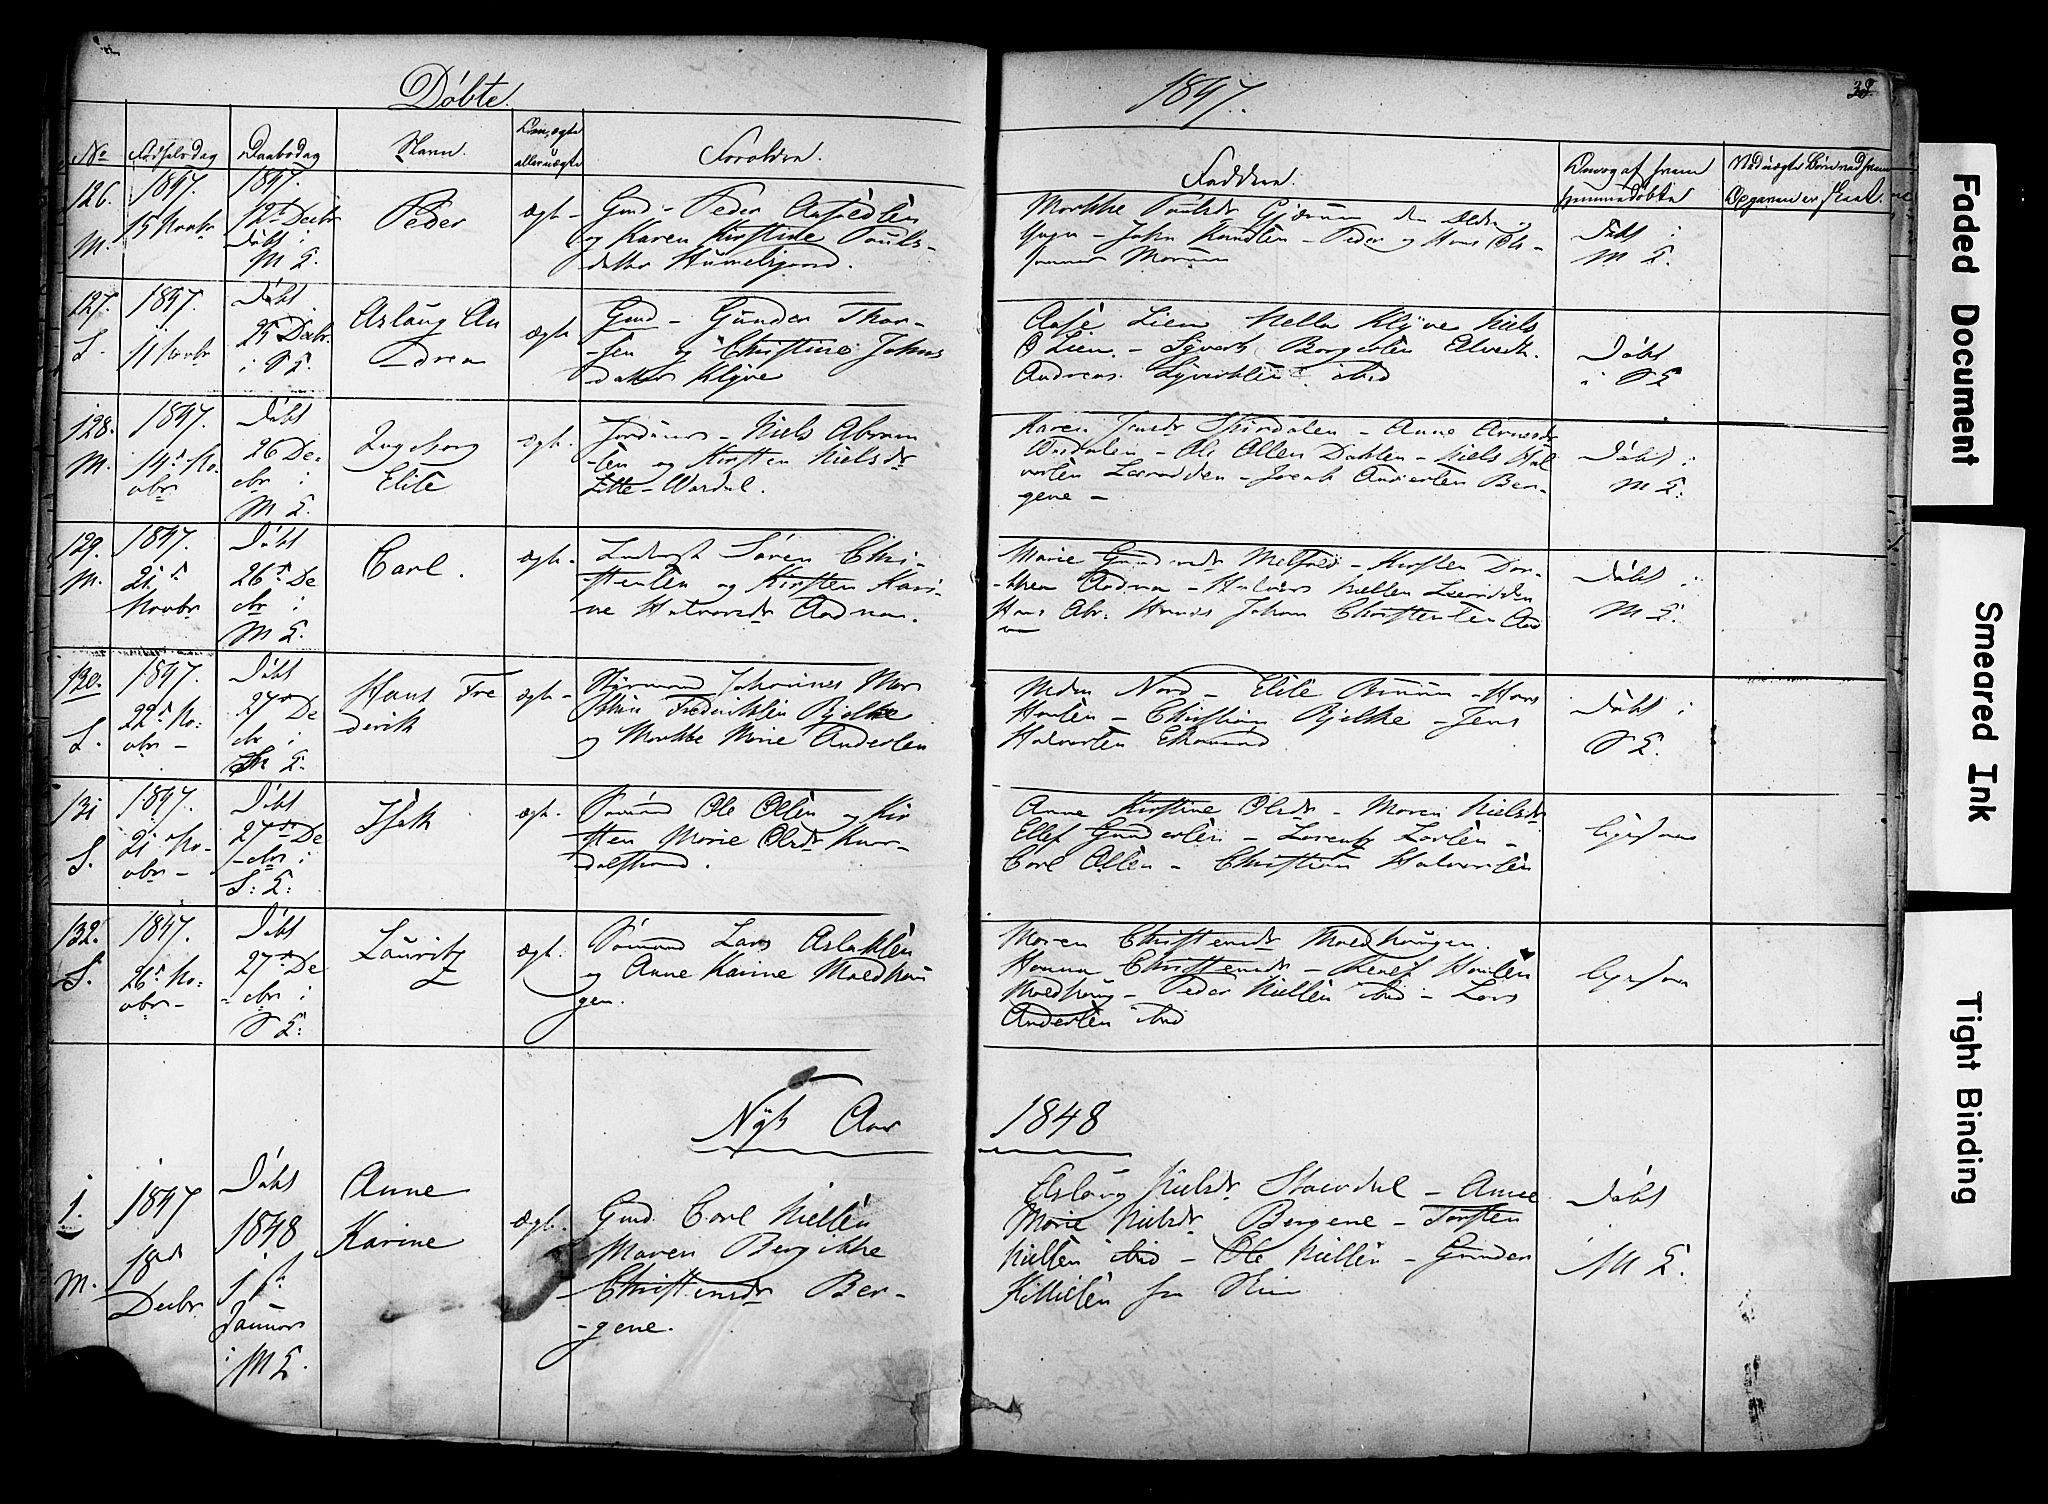 SAKO, Solum kirkebøker, F/Fa/L0006: Ministerialbok nr. I 6, 1844-1855, s. 38